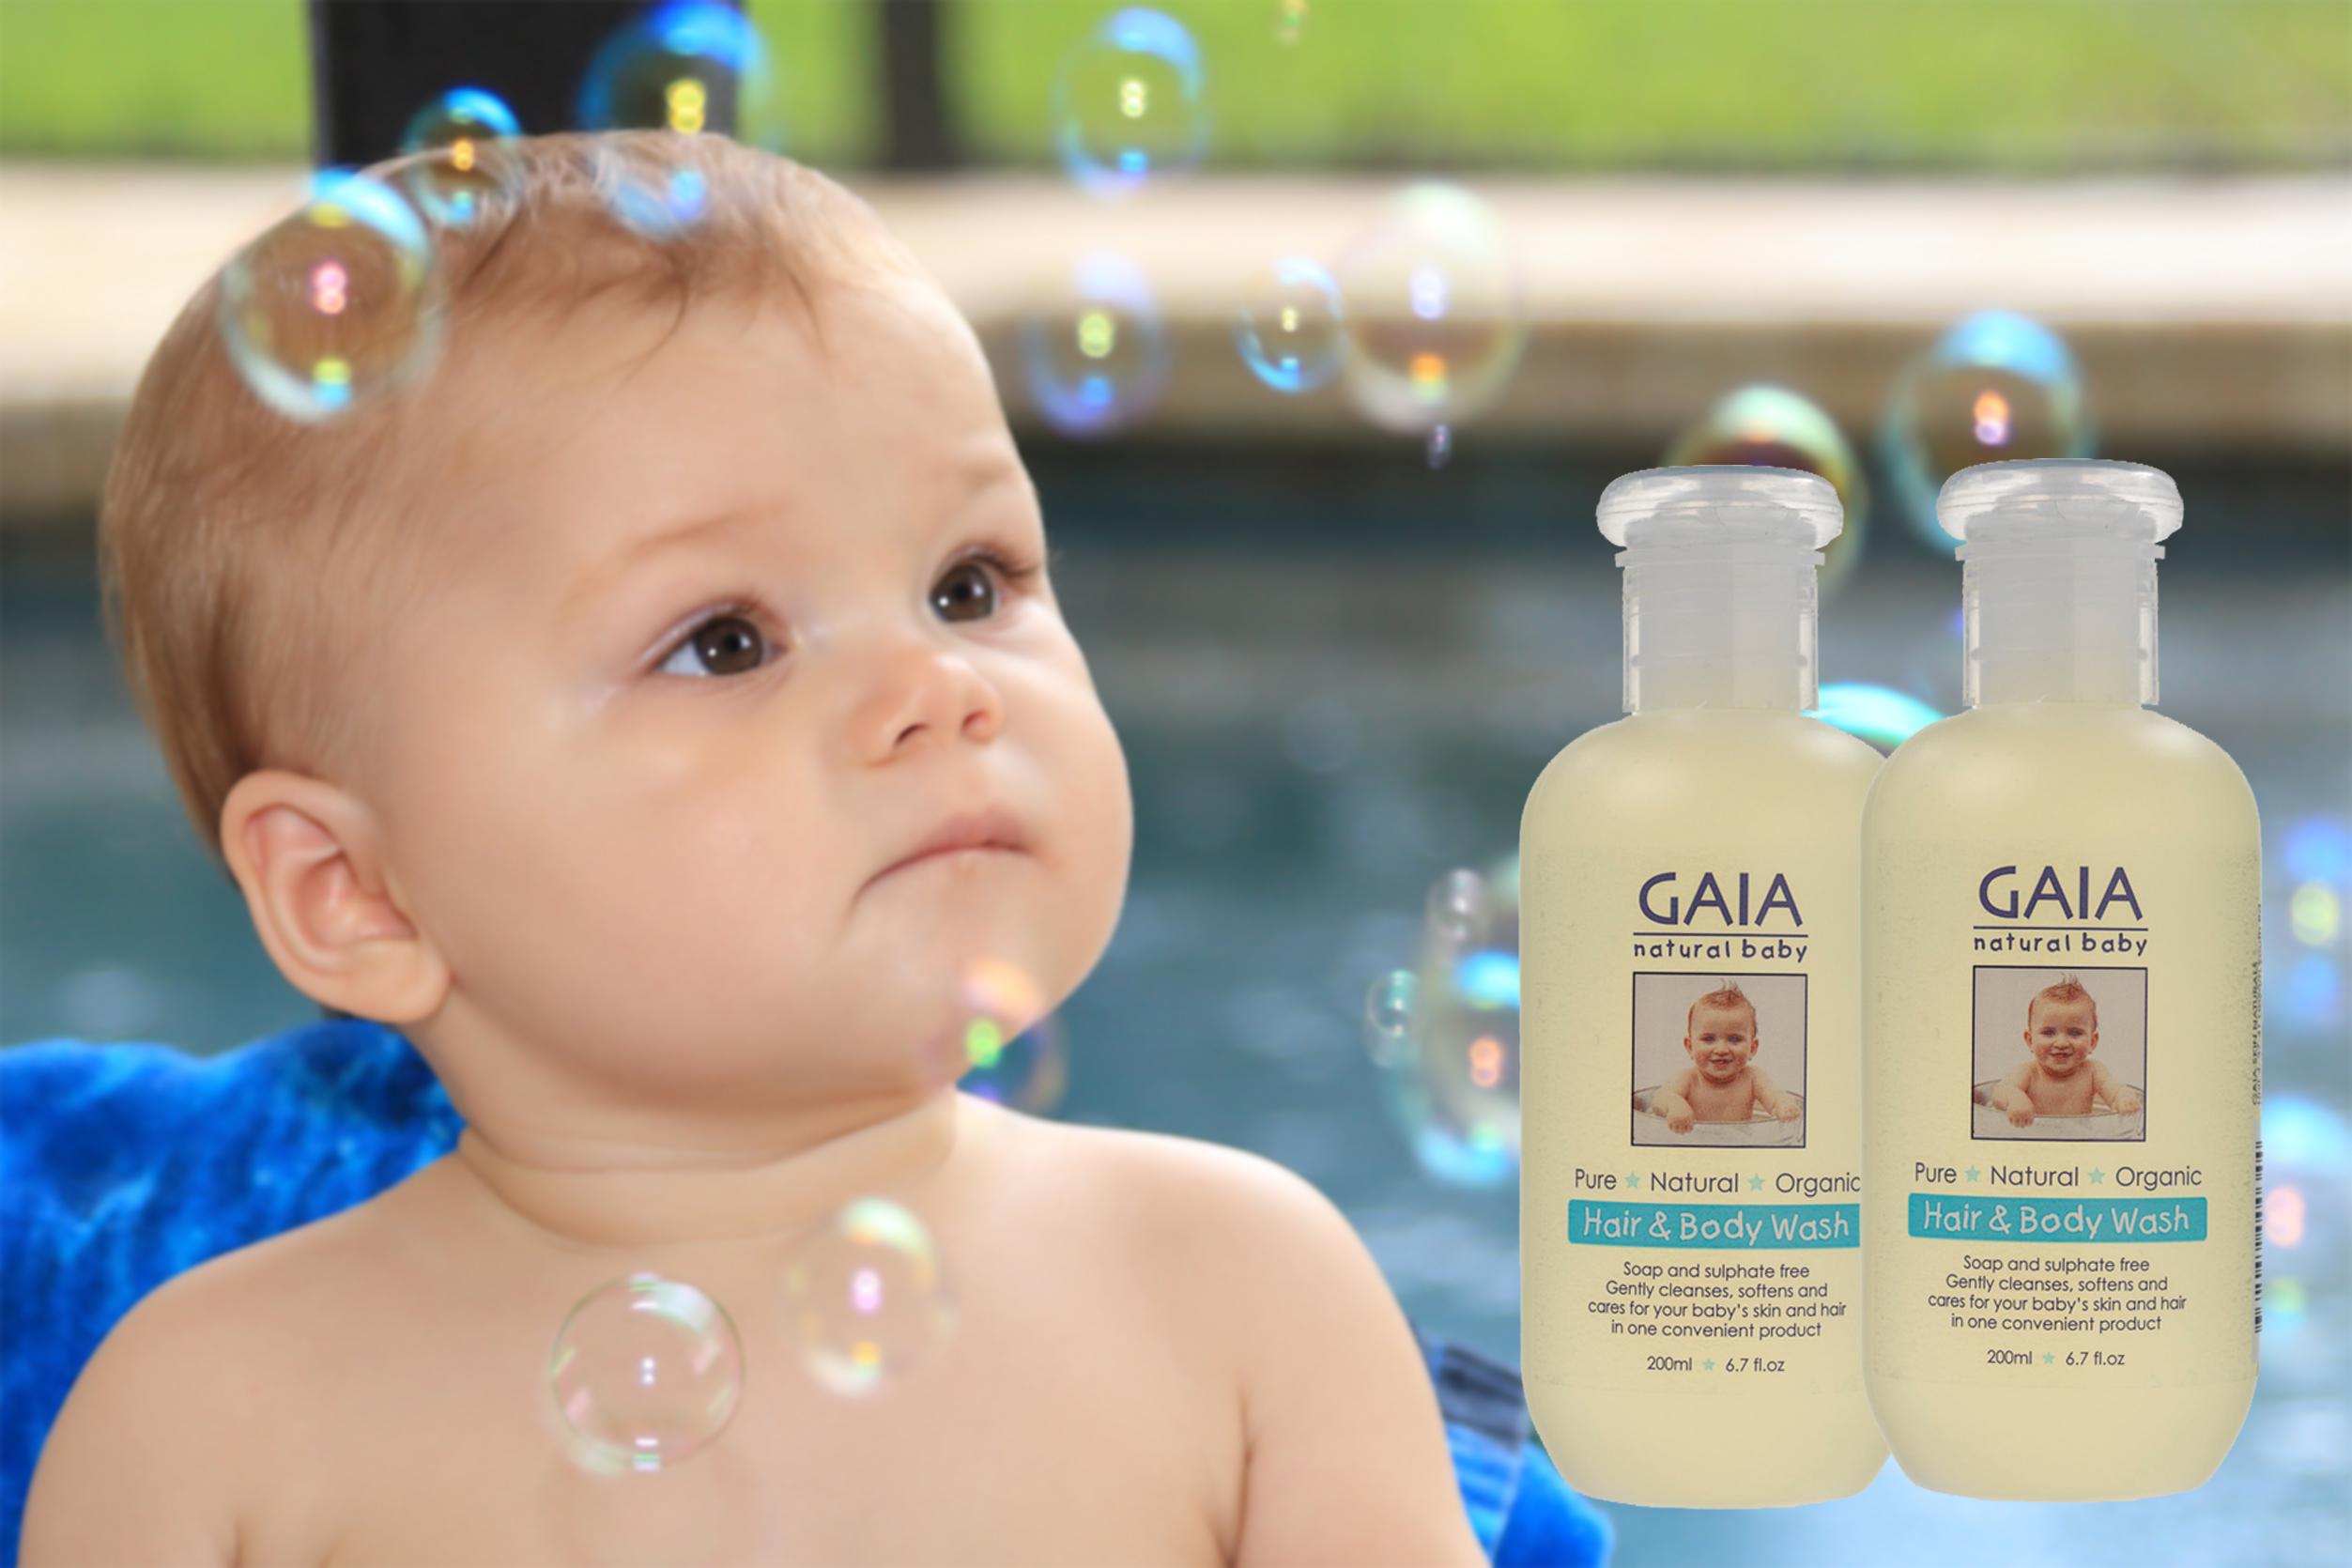 Tắm gội toàn thân hữu cơ GAIA Hair & Body Wash